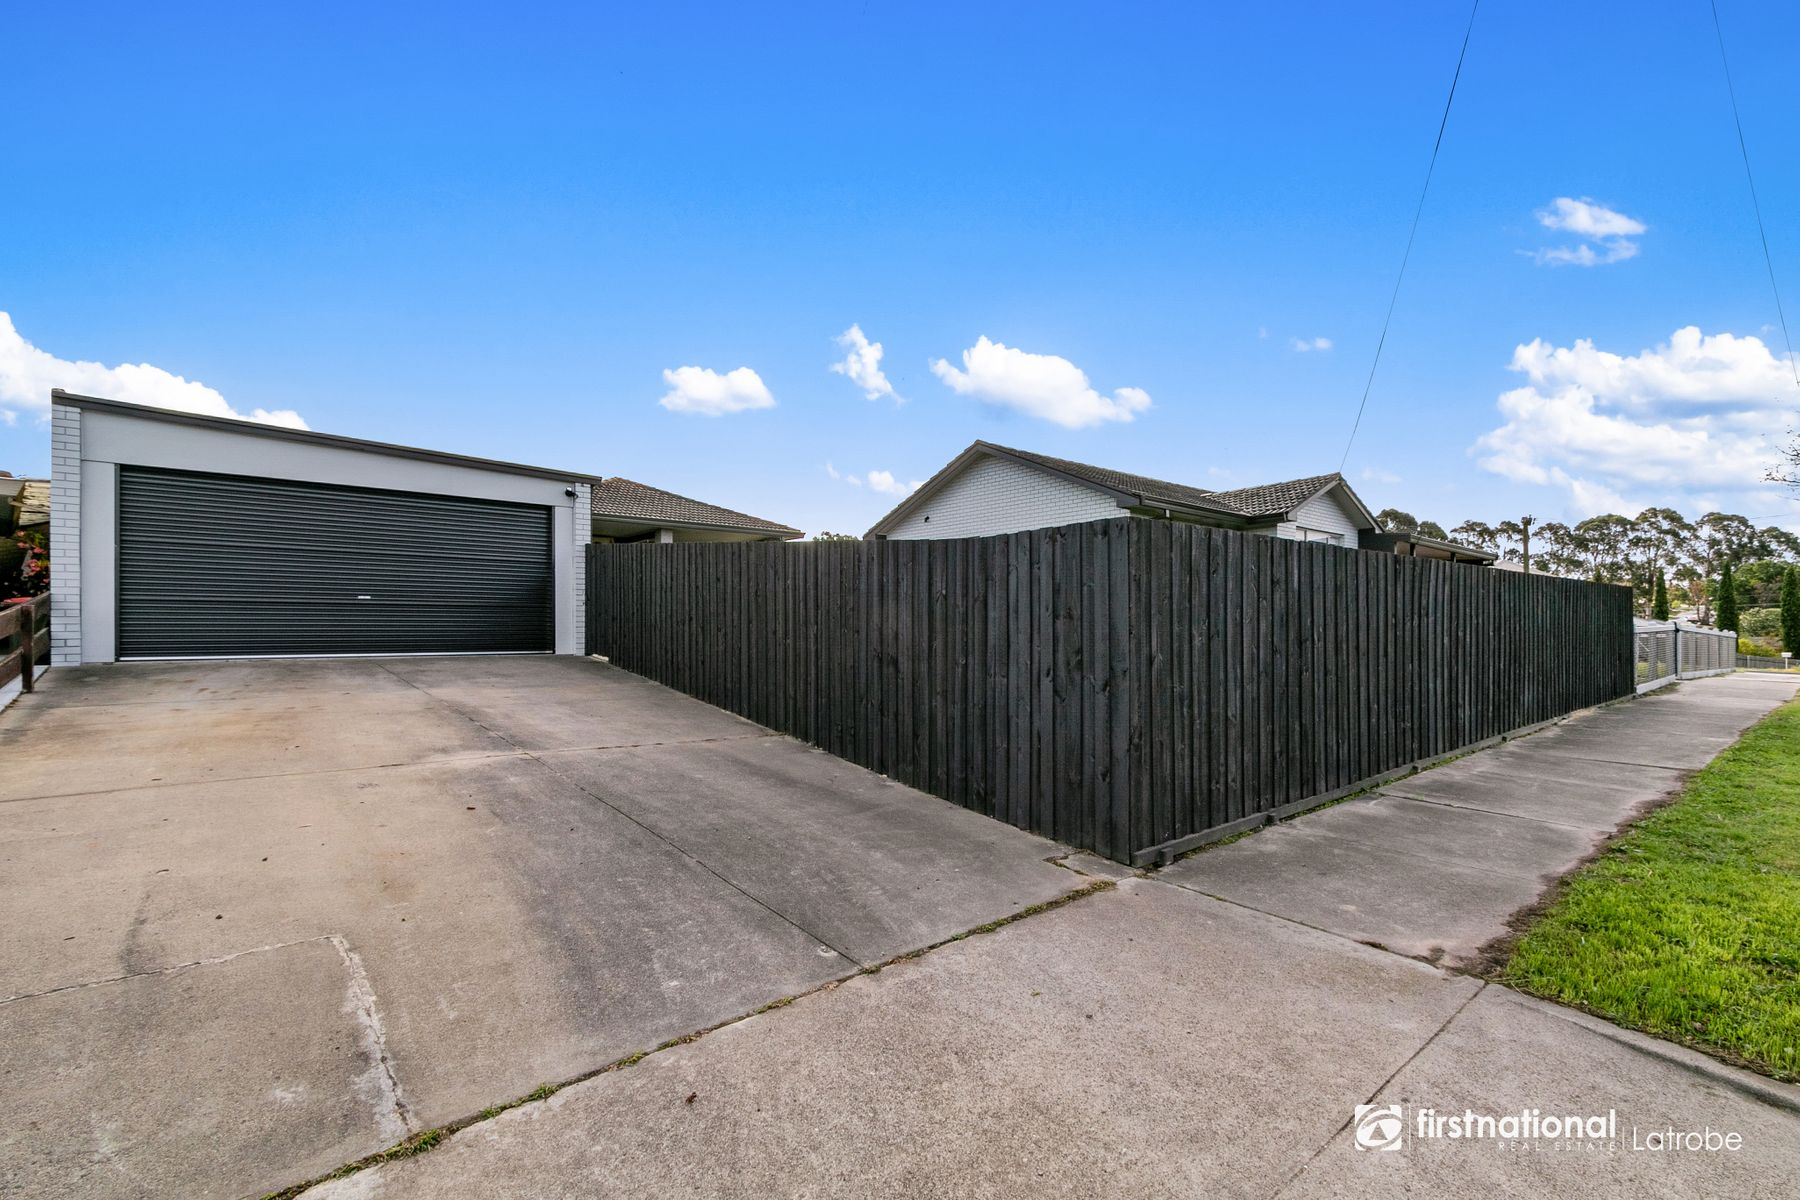 1  Roseneath street, Traralgon, VIC 3844